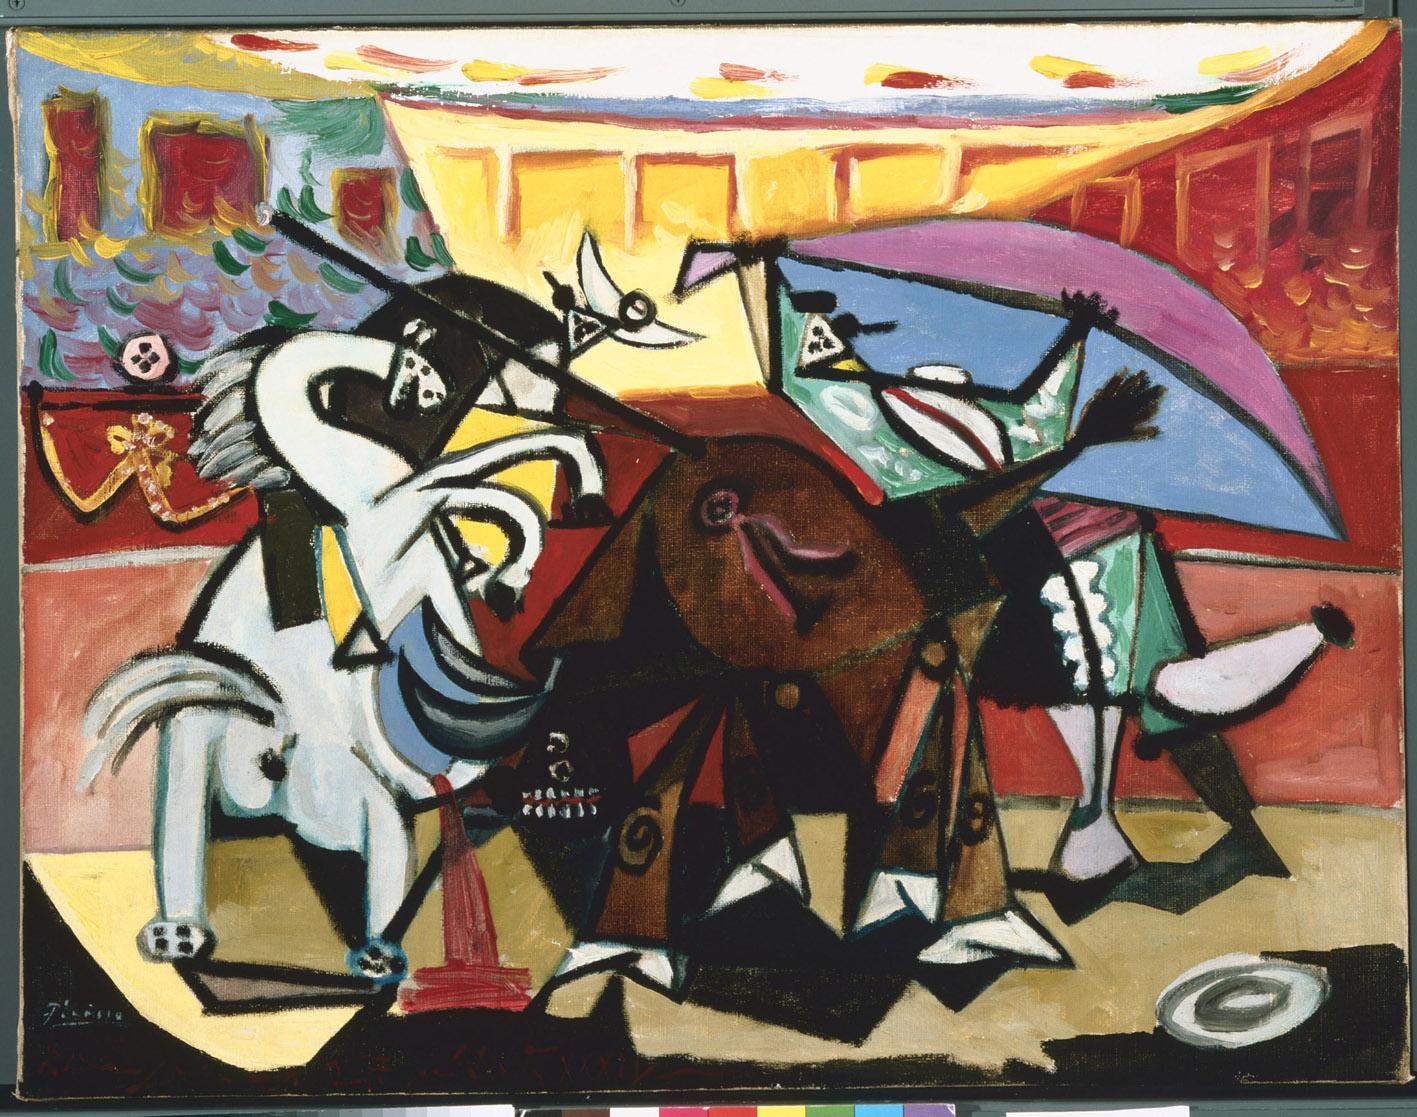 Tauromachia, 1934, por Pablo Picasso, óleo sobre lienzo, 49,8 x 65,4 cm, The Phillips Collection, Washington, D.C., adquirido en 1937.